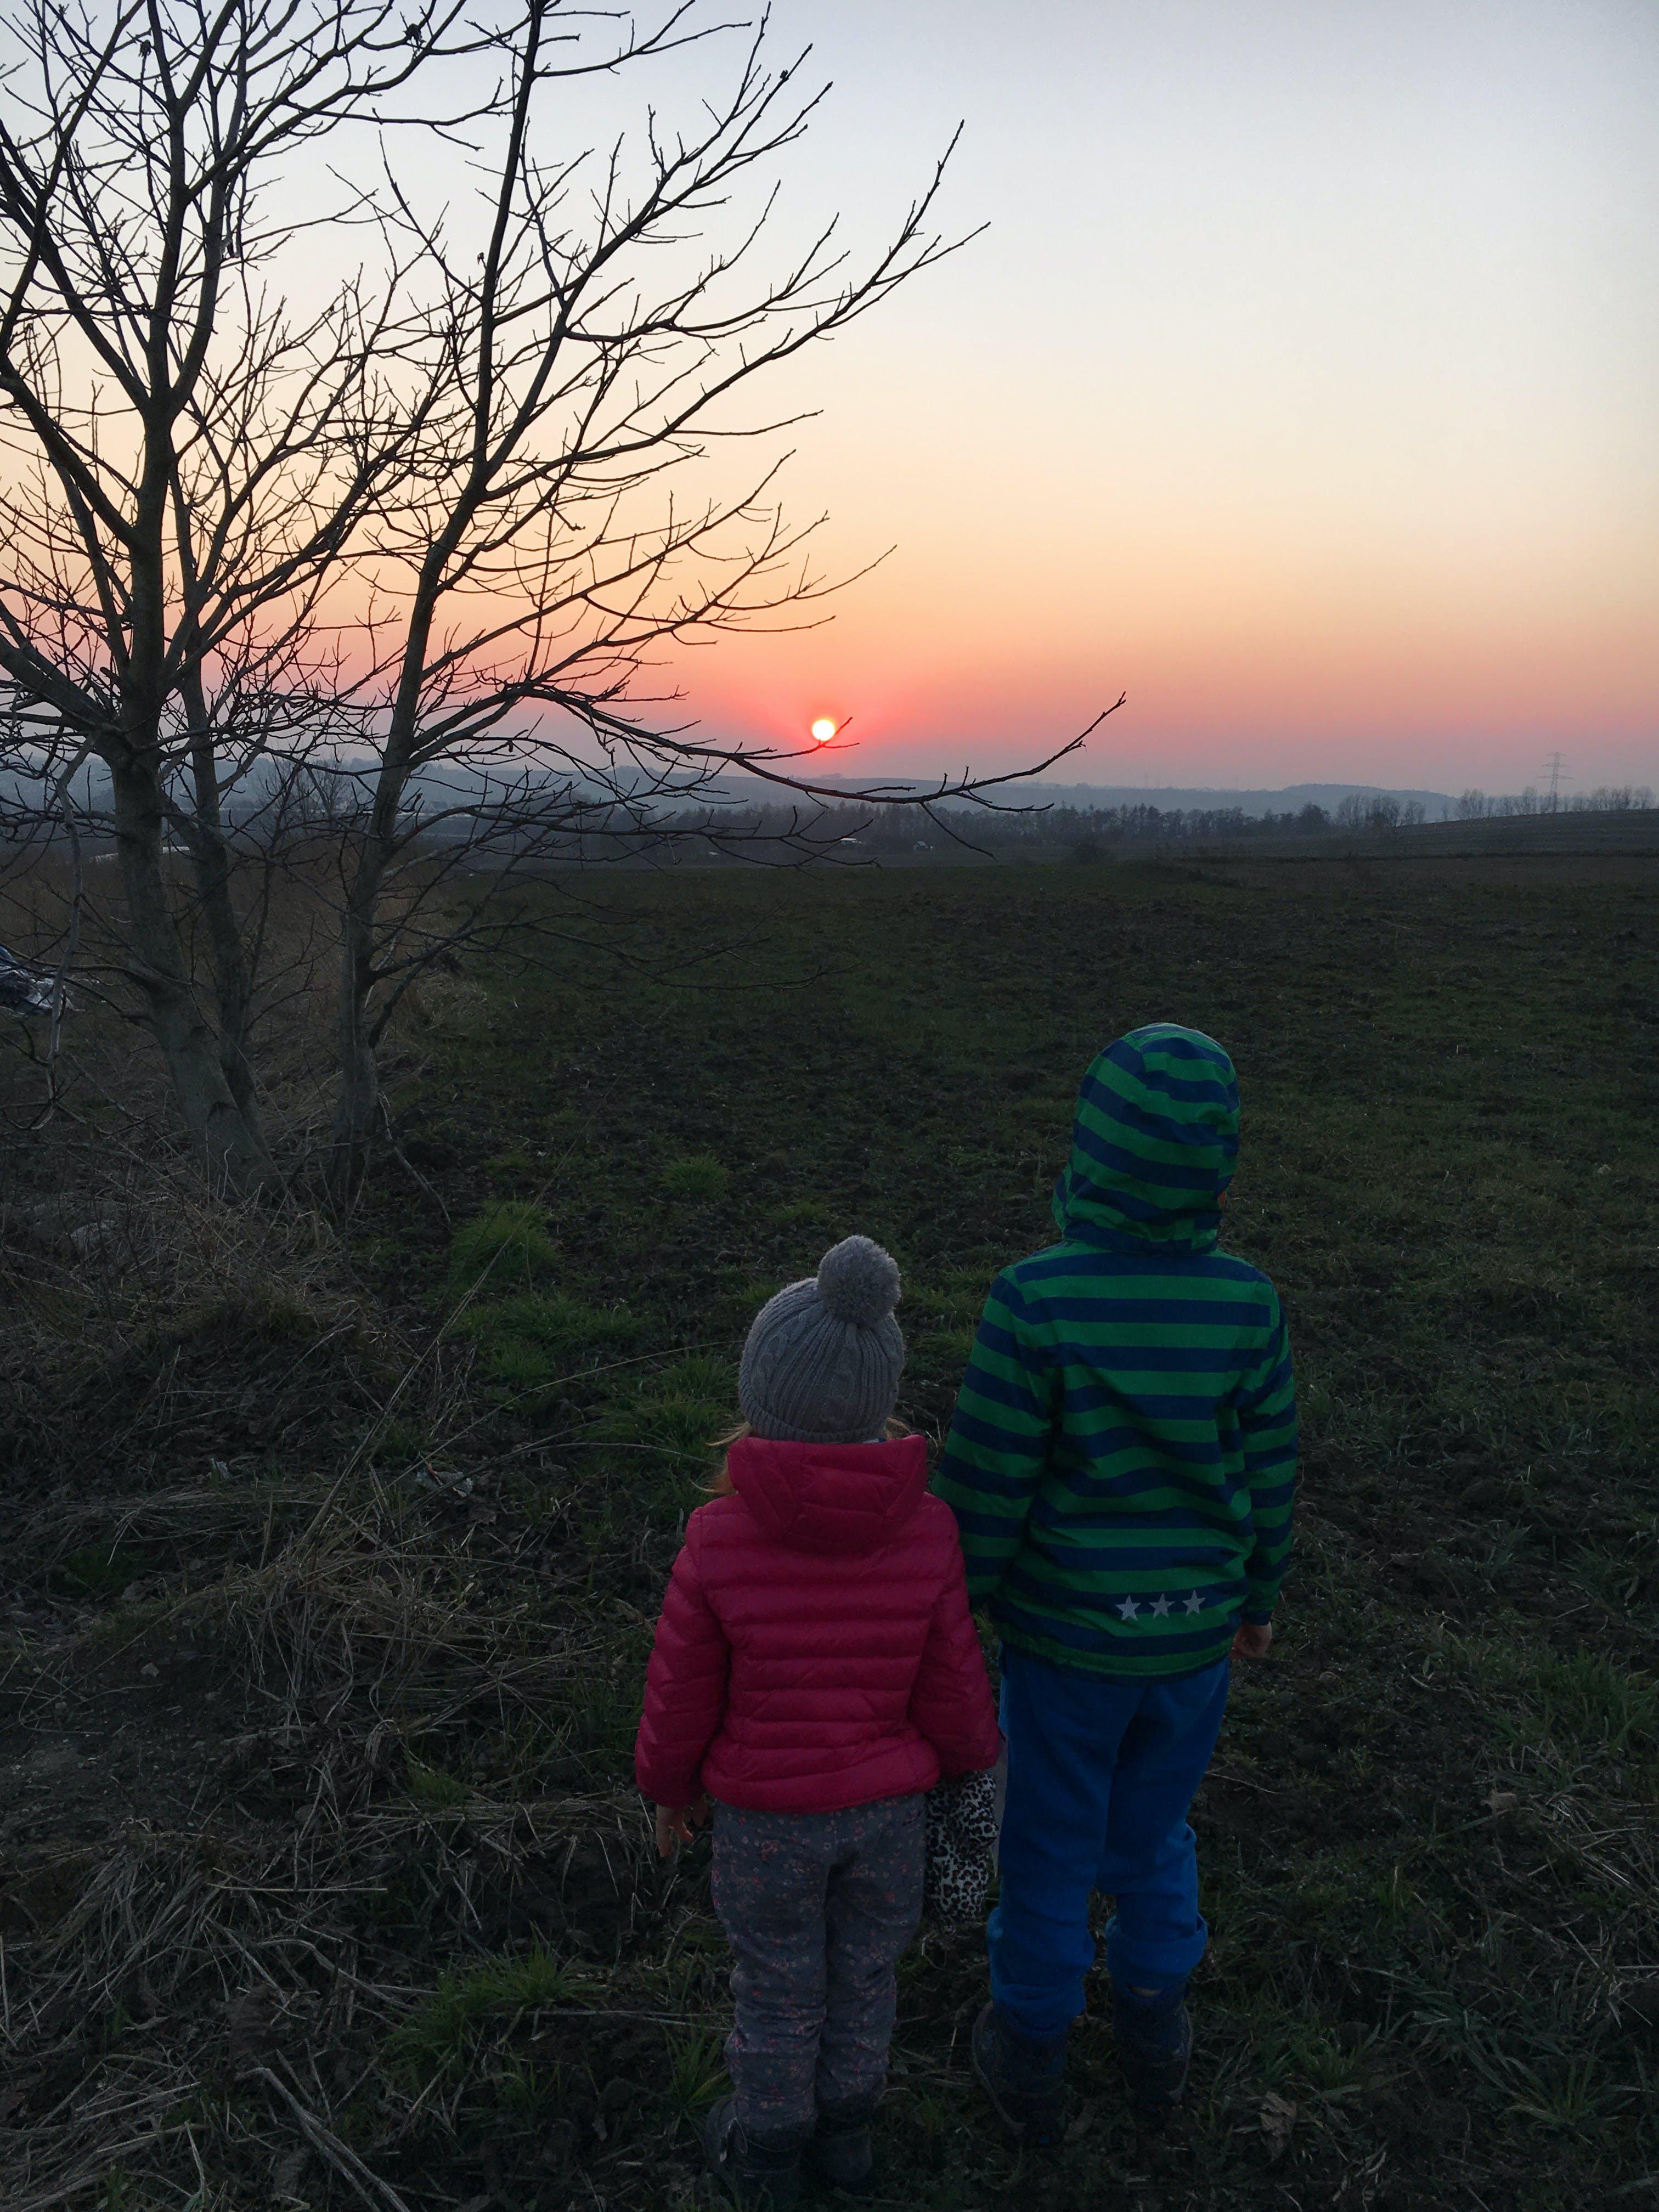 Free stock photo of sunset, kids